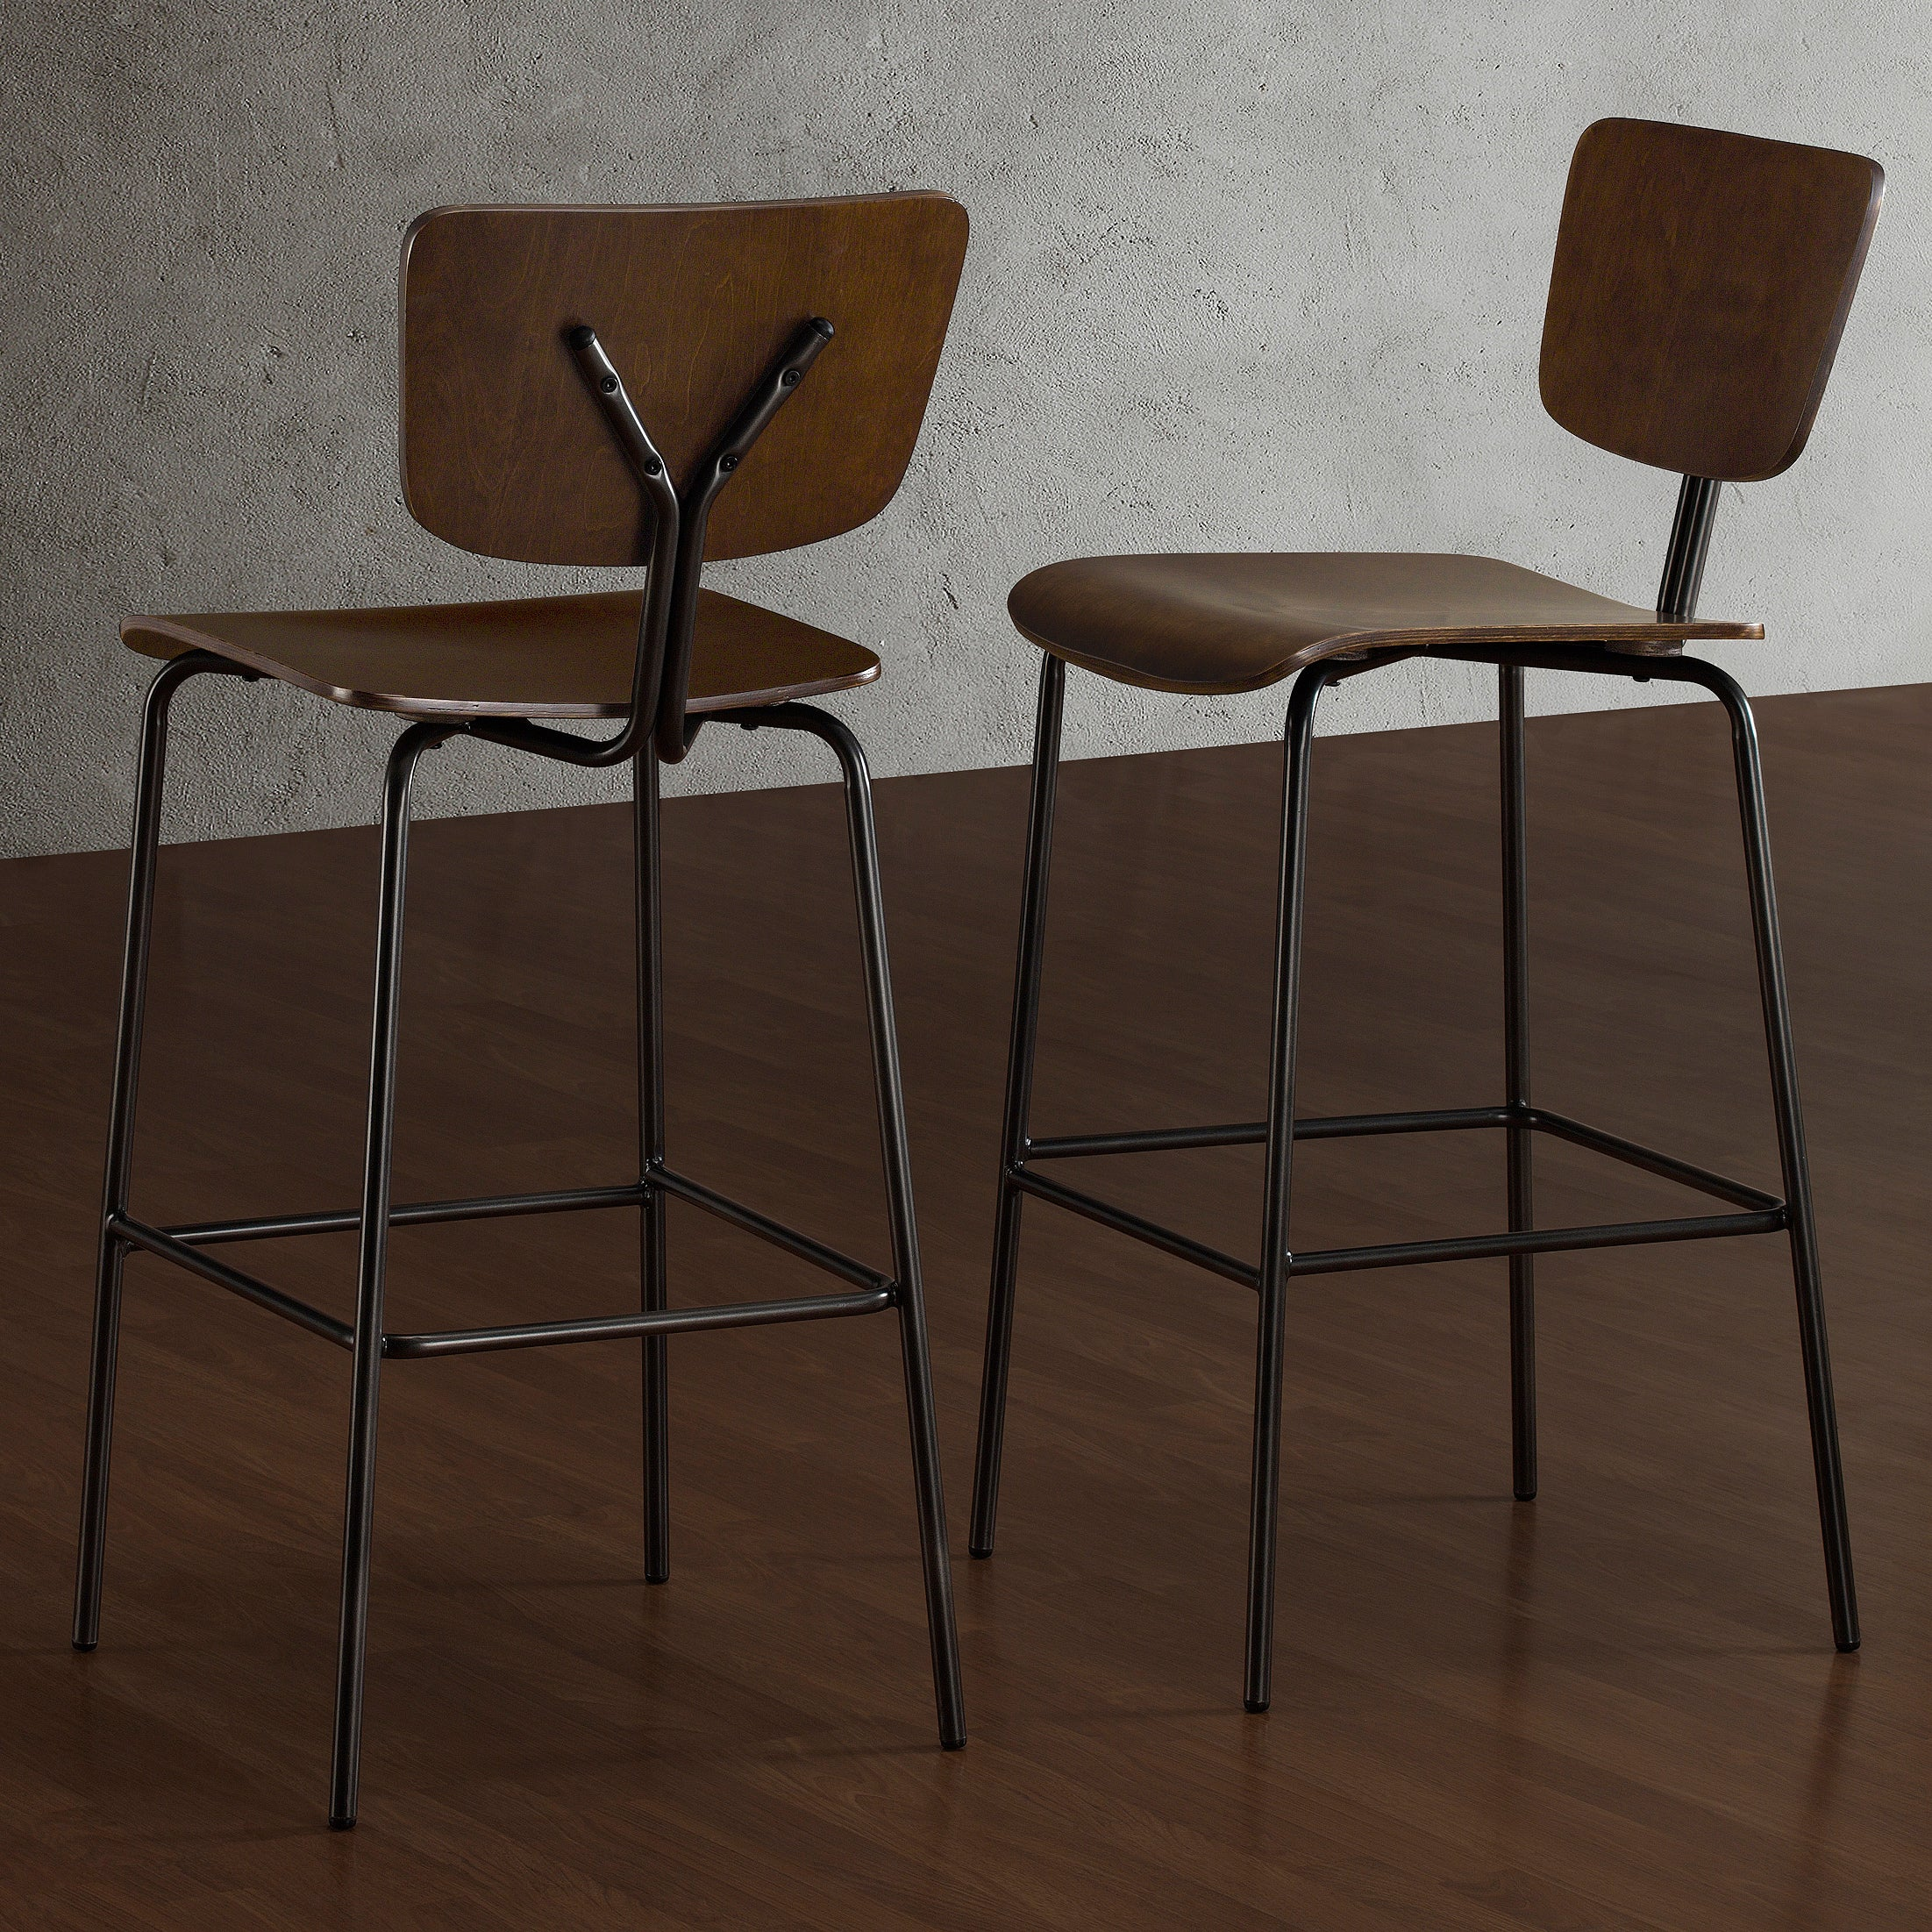 30 inch bar stools set of 2 dark walnut cushioned bar stool